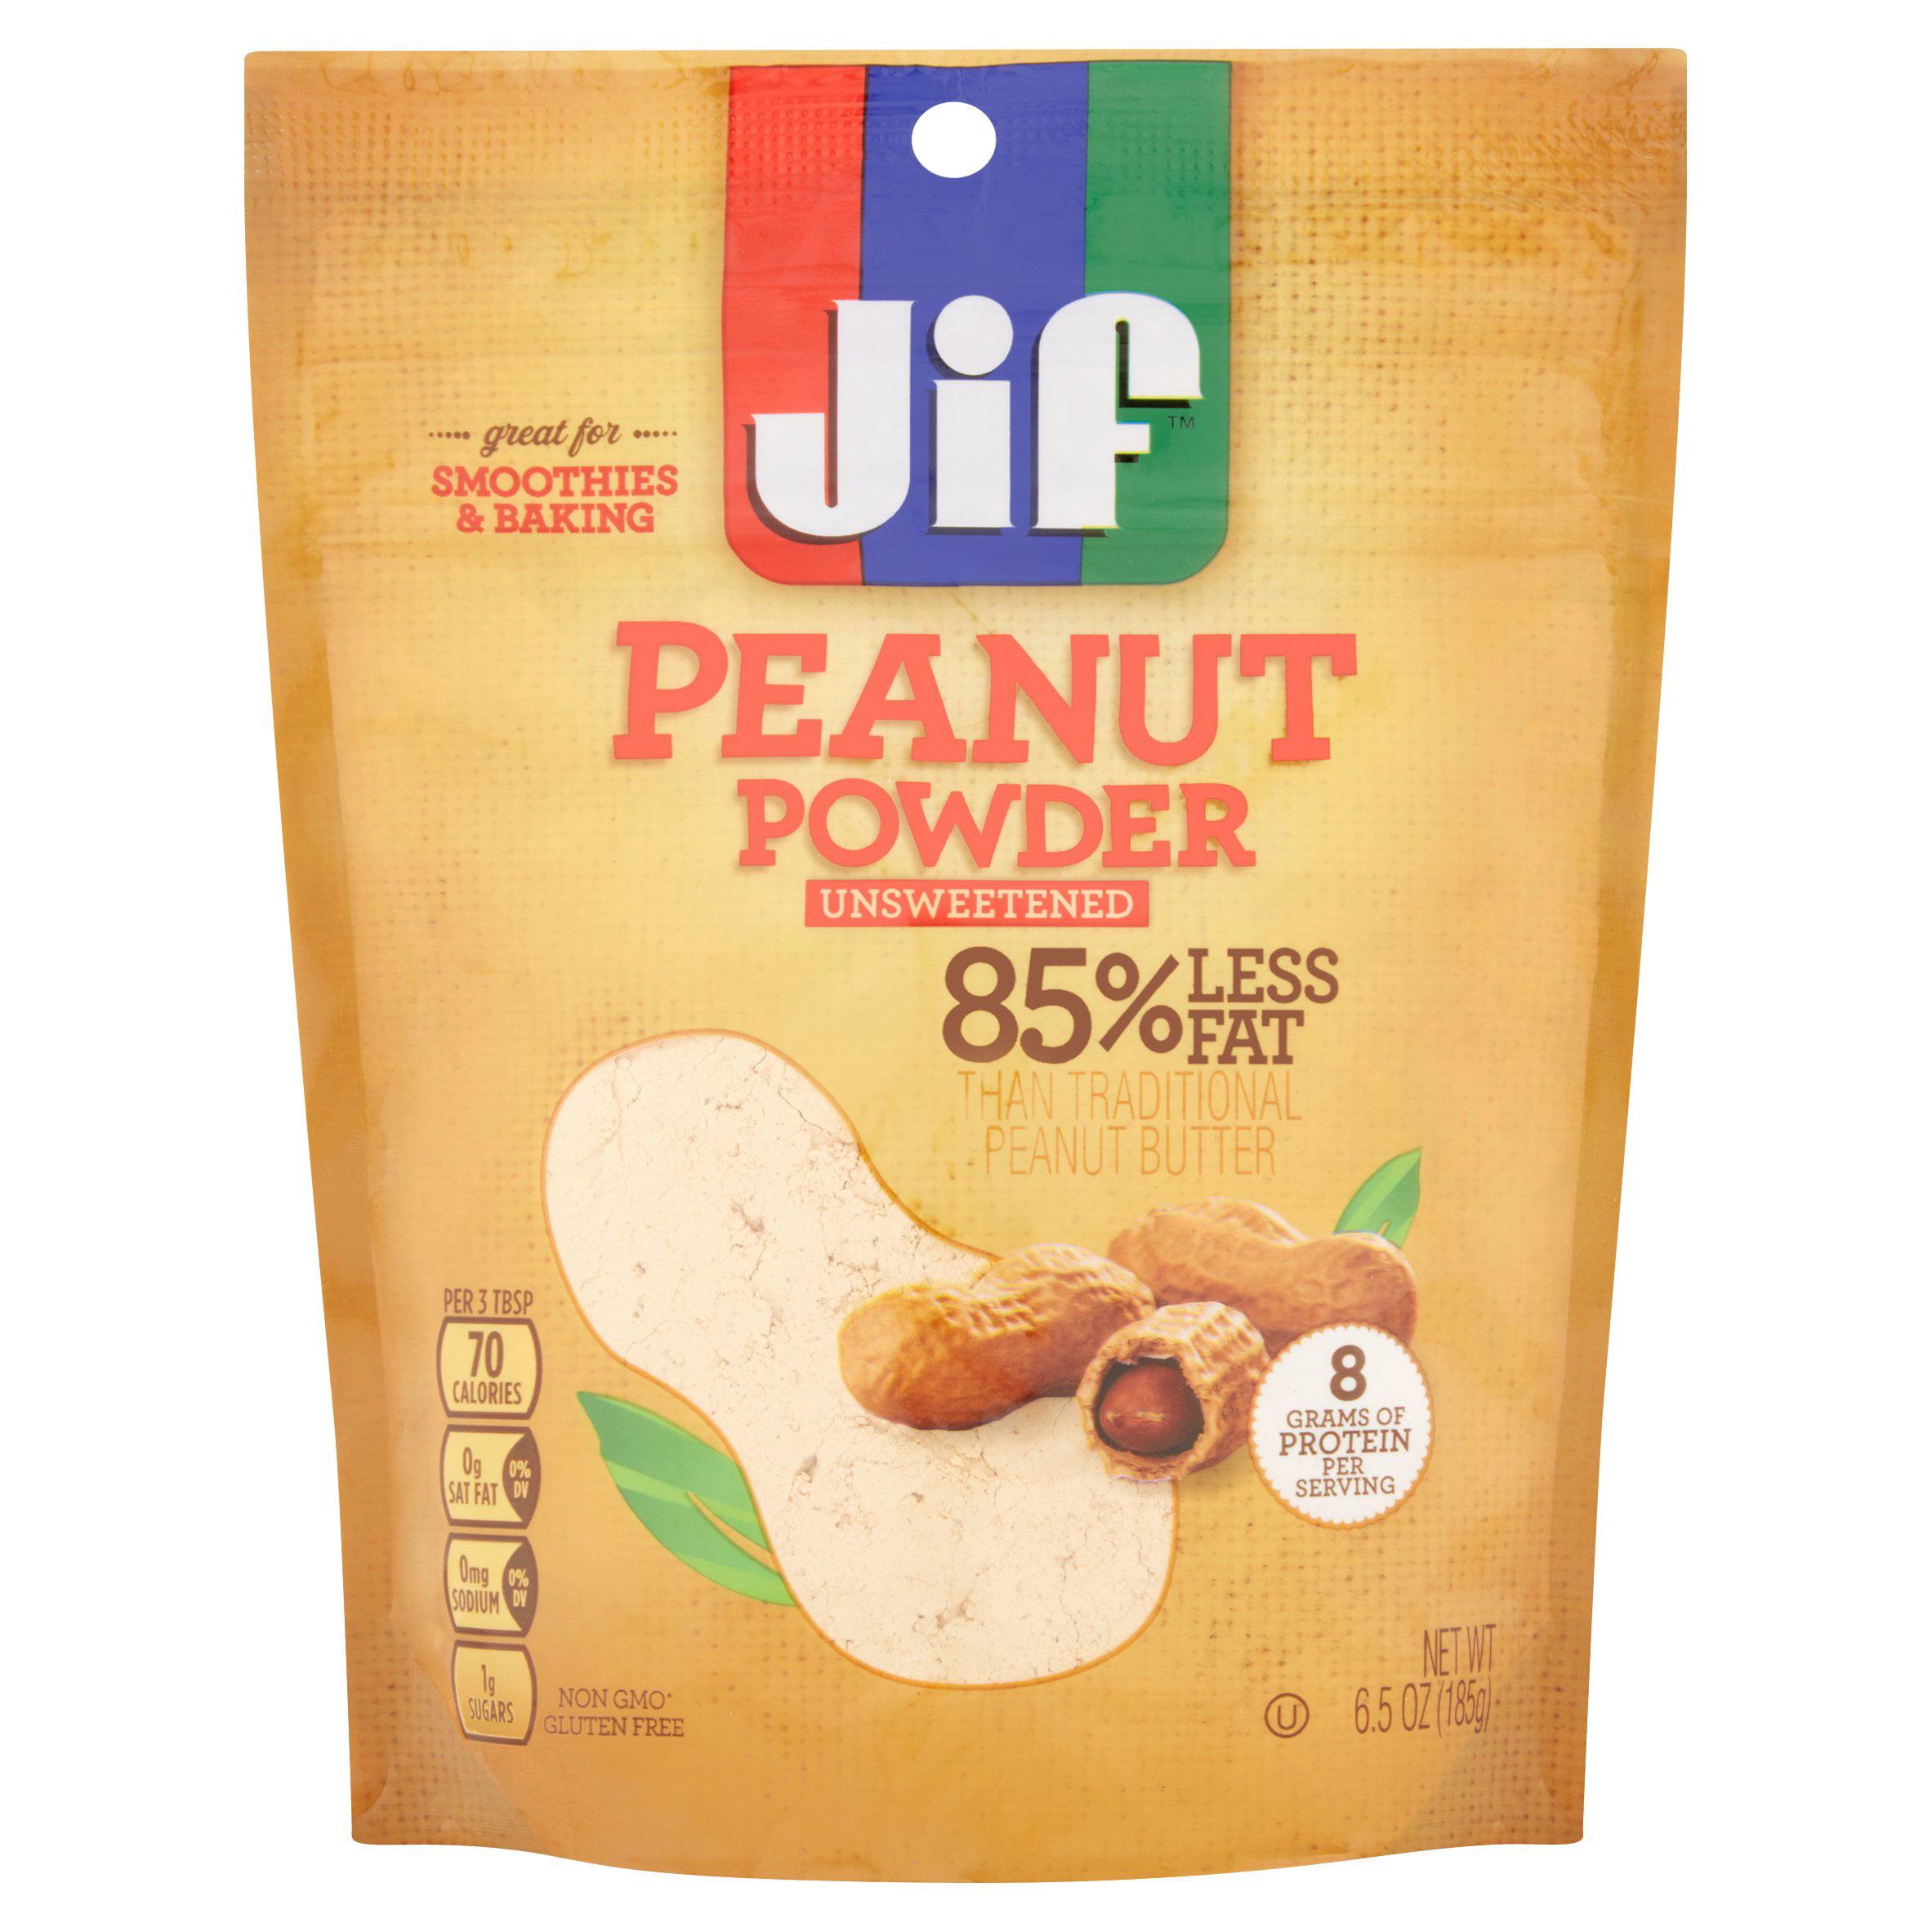 Jif Unsweetened Peanut Powder, 6.5 oz